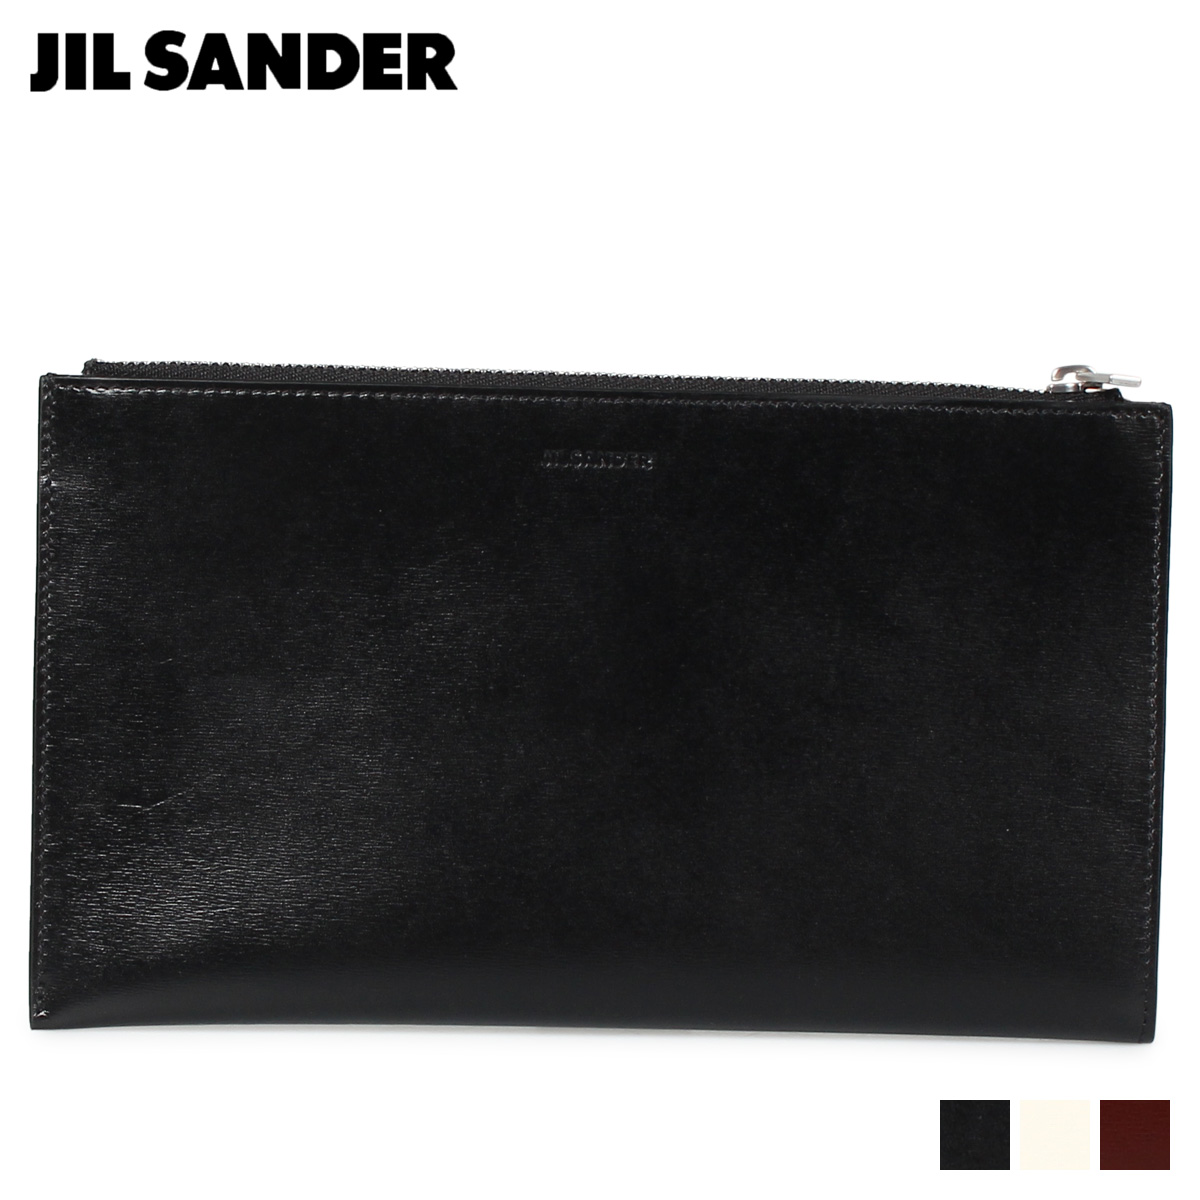 JIL SANDER ジルサンダー 財布 長財布 メンズ FOLDED ZIP WALLET MD ブラック ホワイト ブラウン 黒 白 MPS00015N